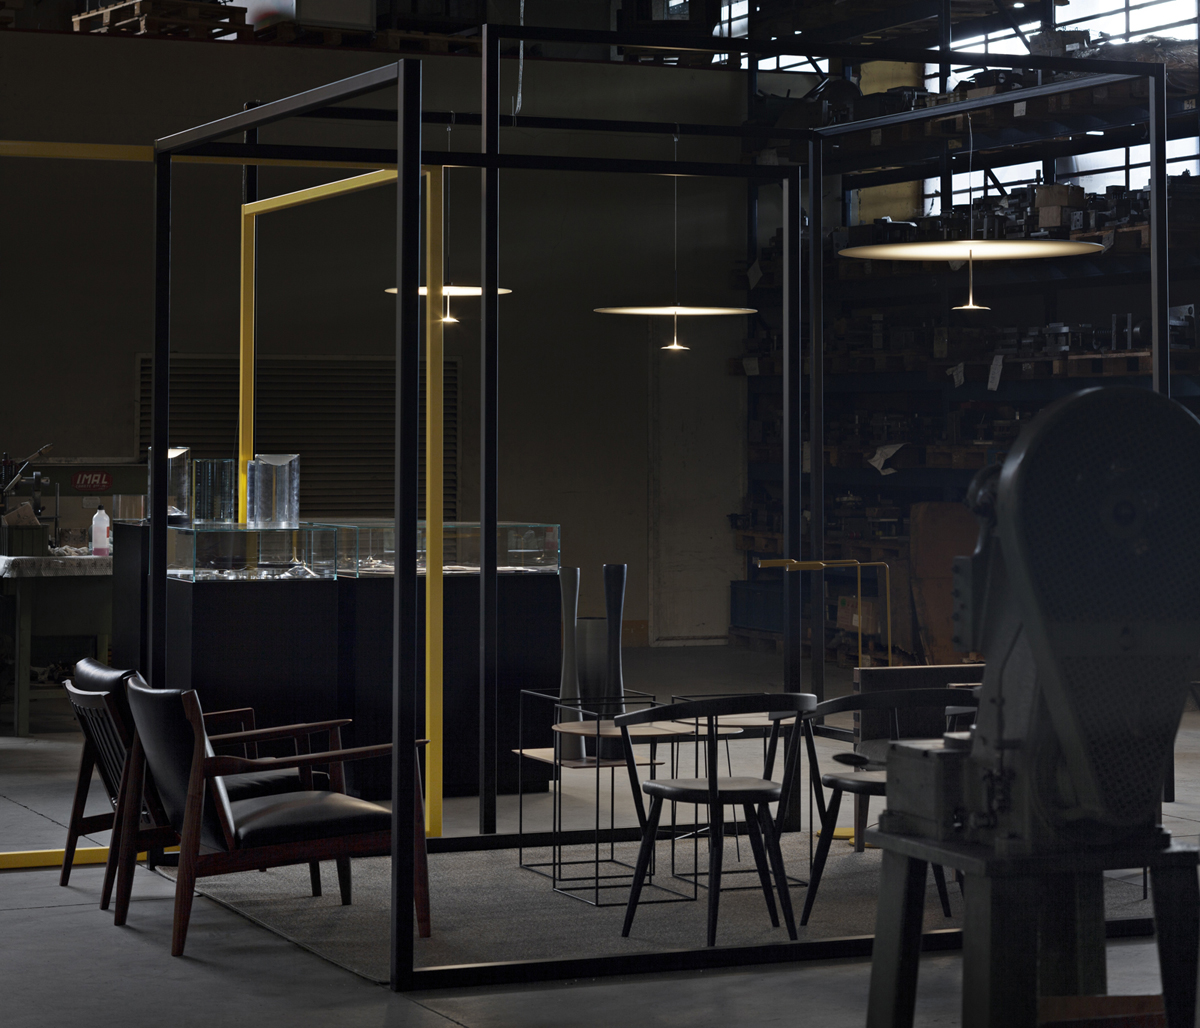 05_Lumina_Foster+Partners_Silvia Fanticelli